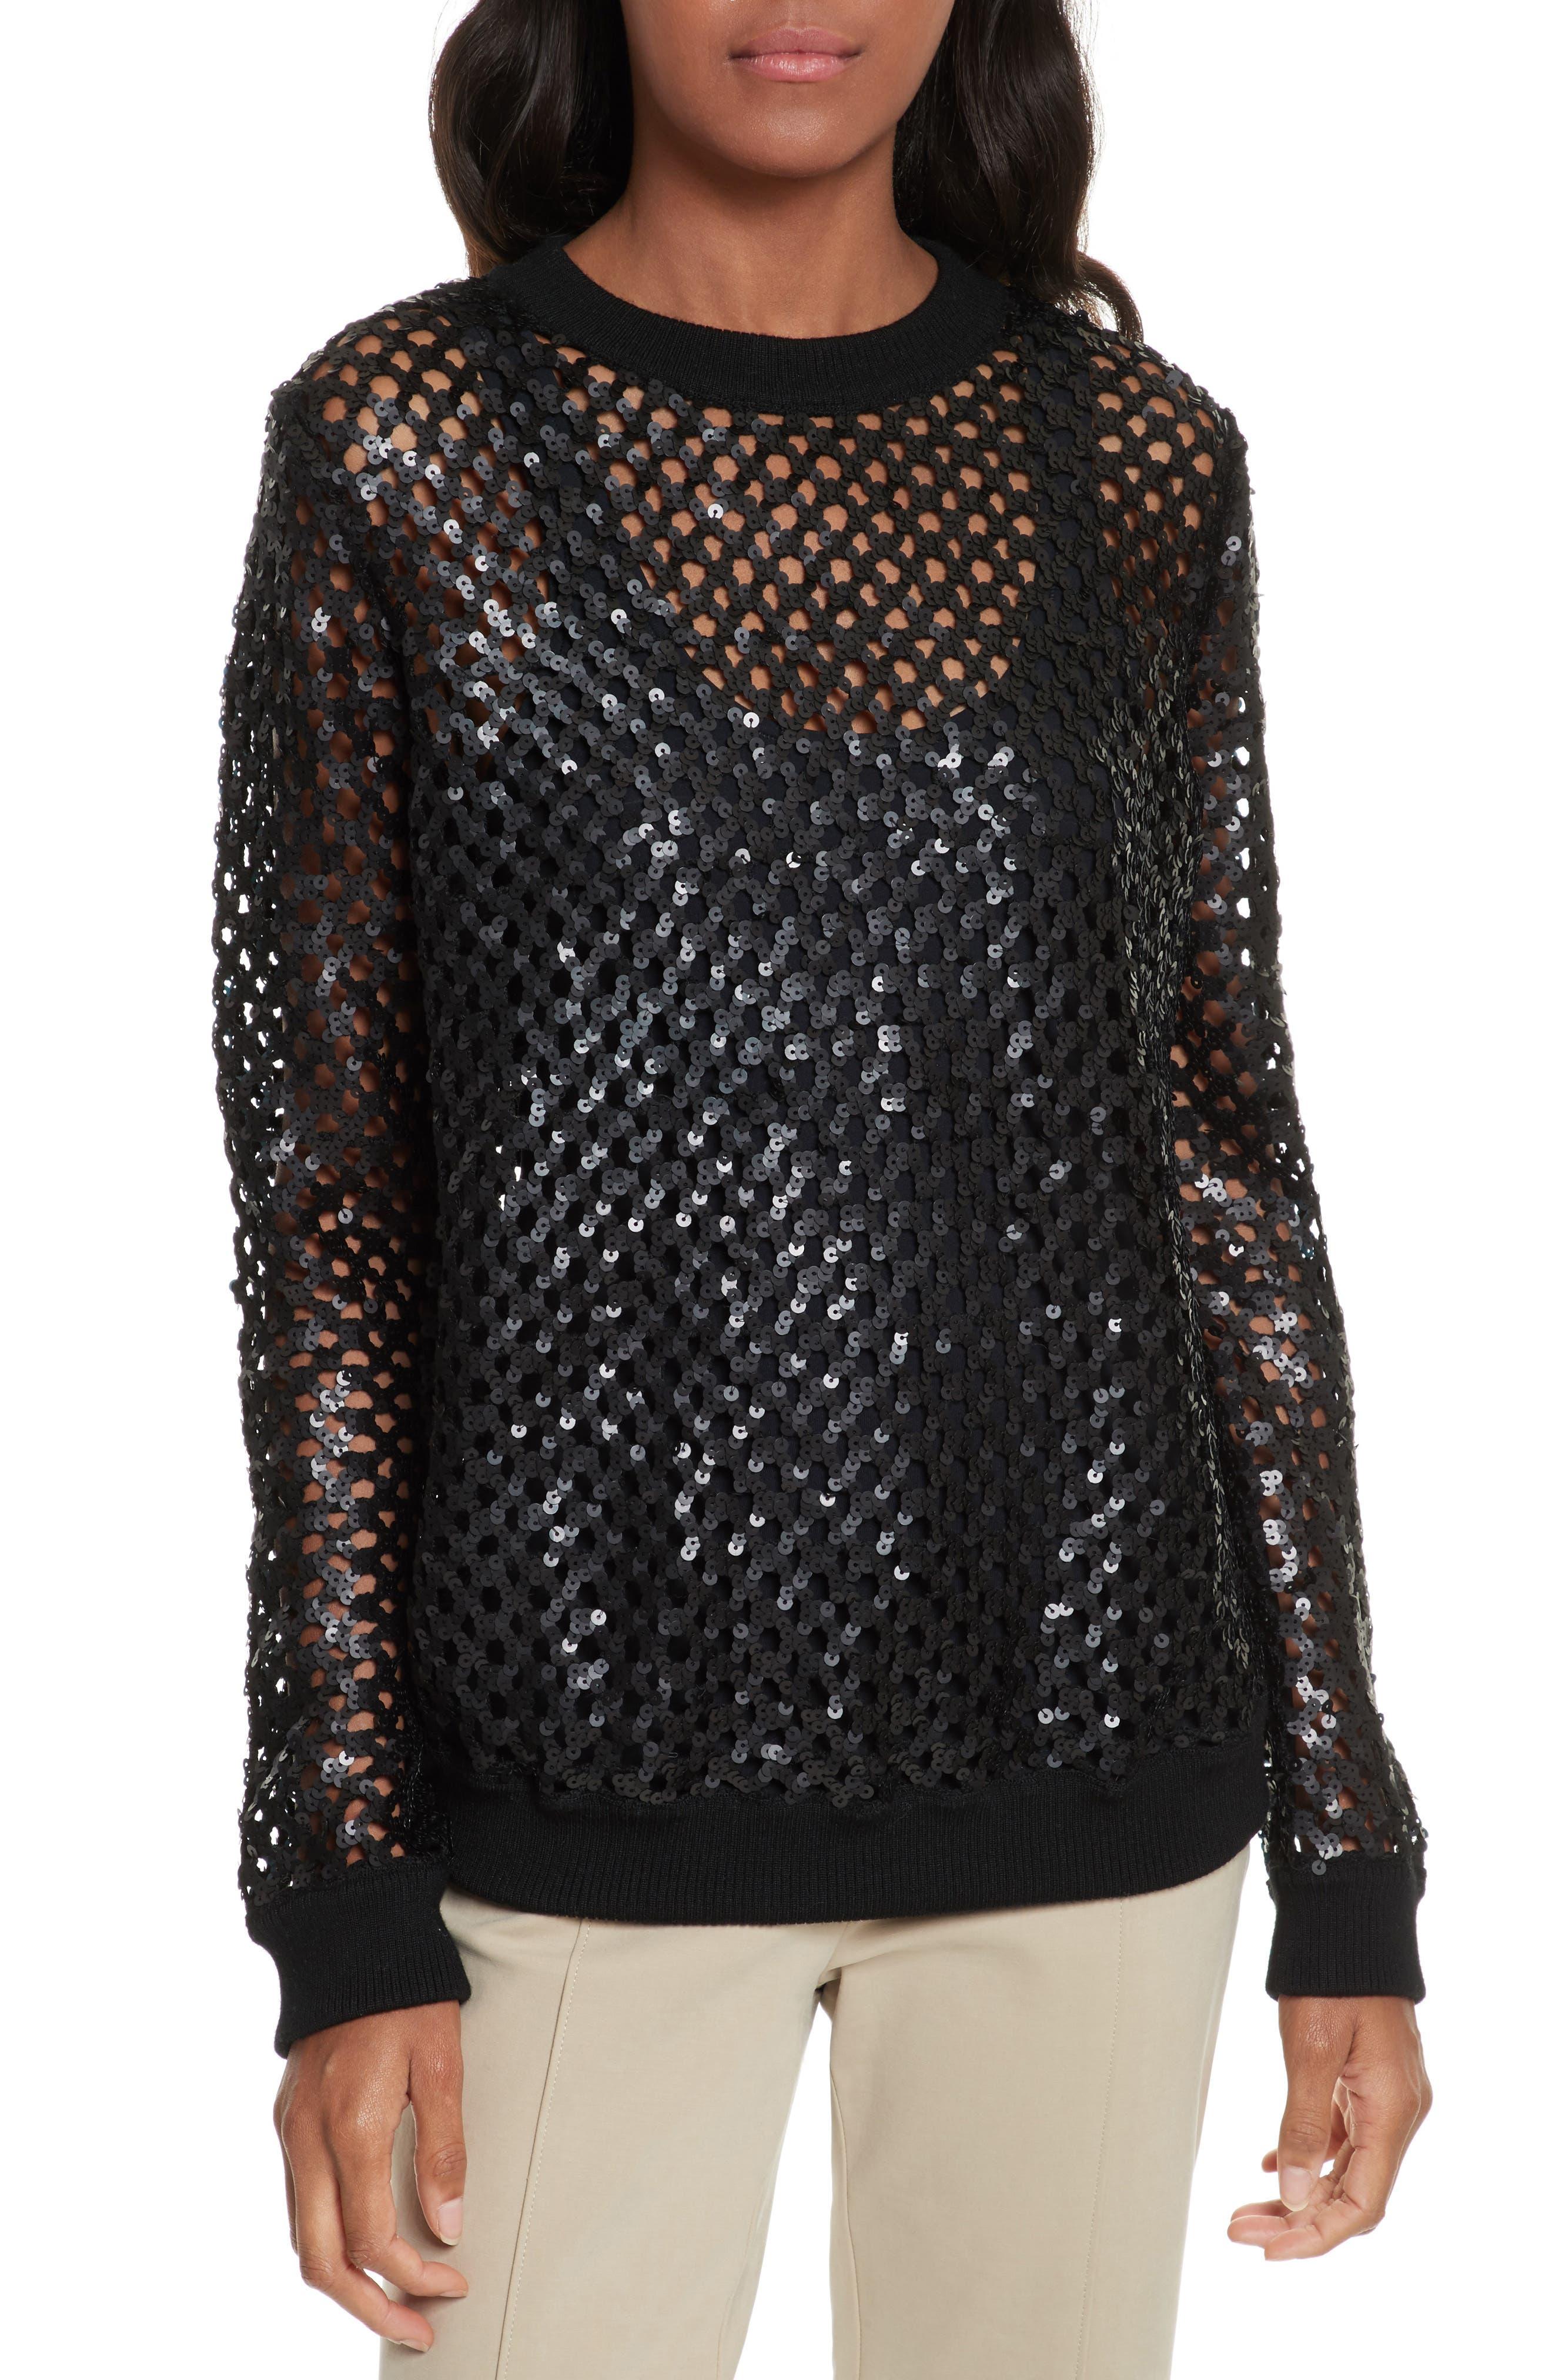 Main Image - Tory Burch Lansing Sequin Mesh Sweater